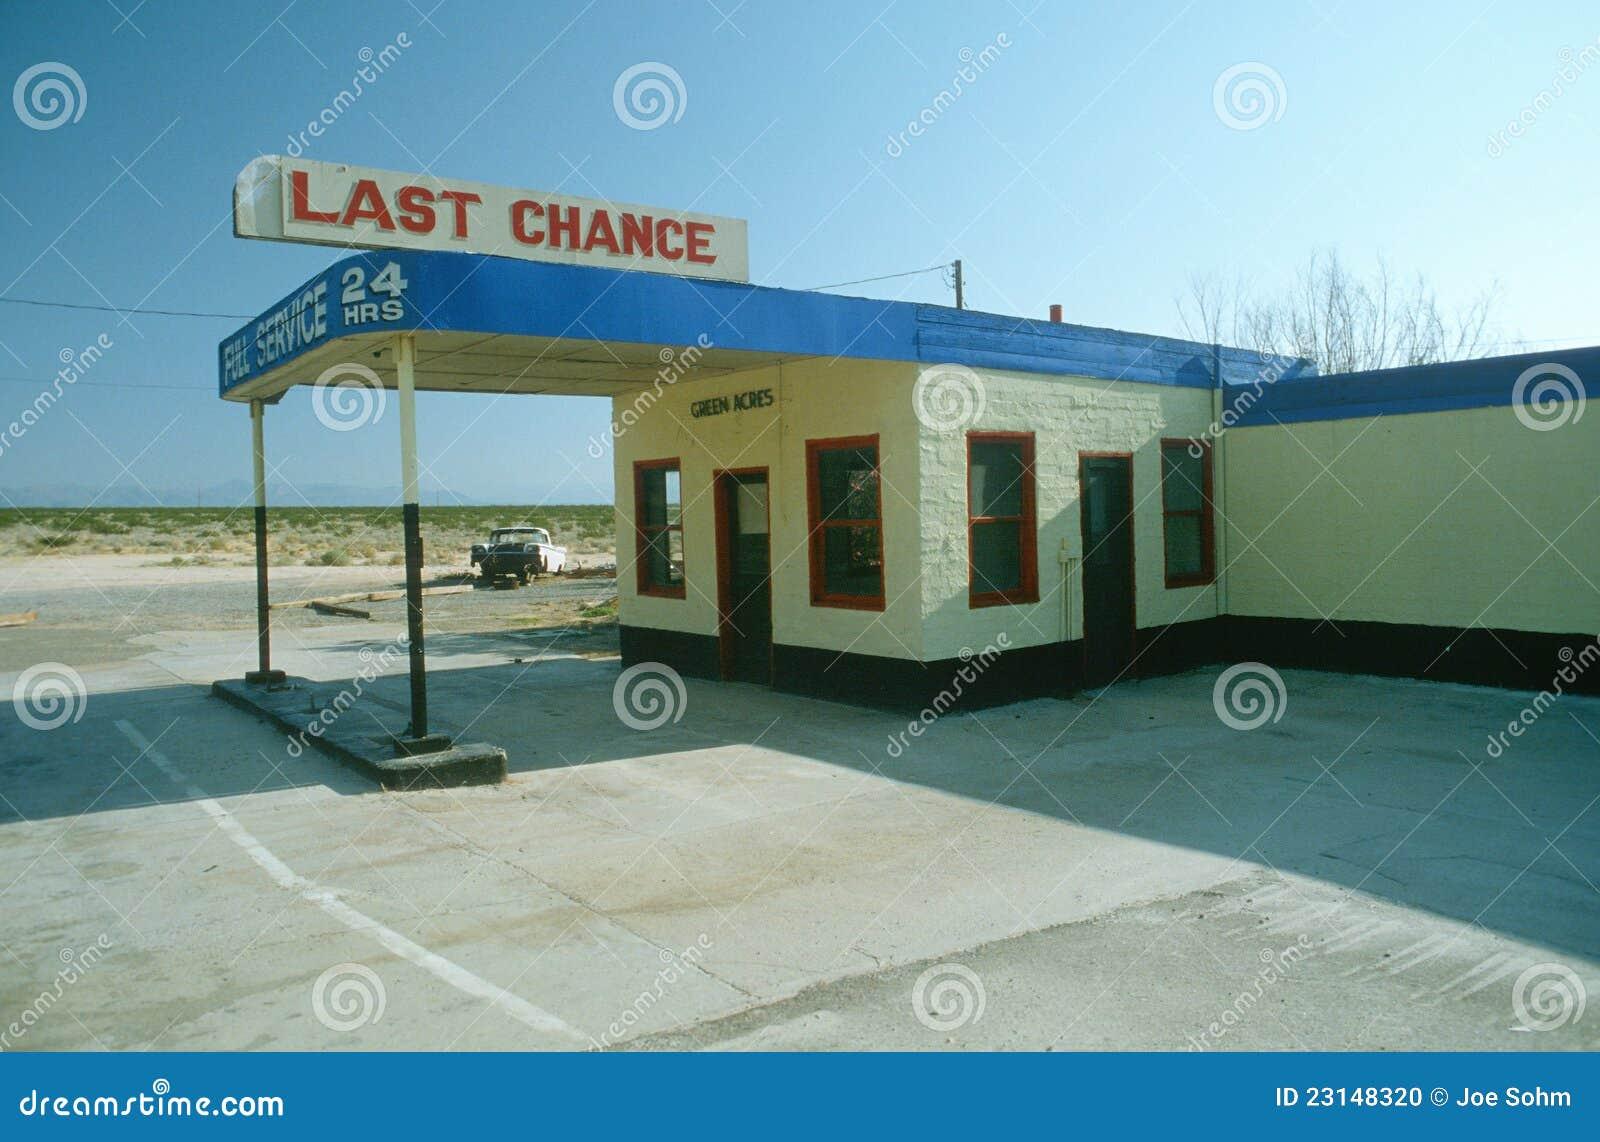 last-chance-gas-station-23148320.jpg